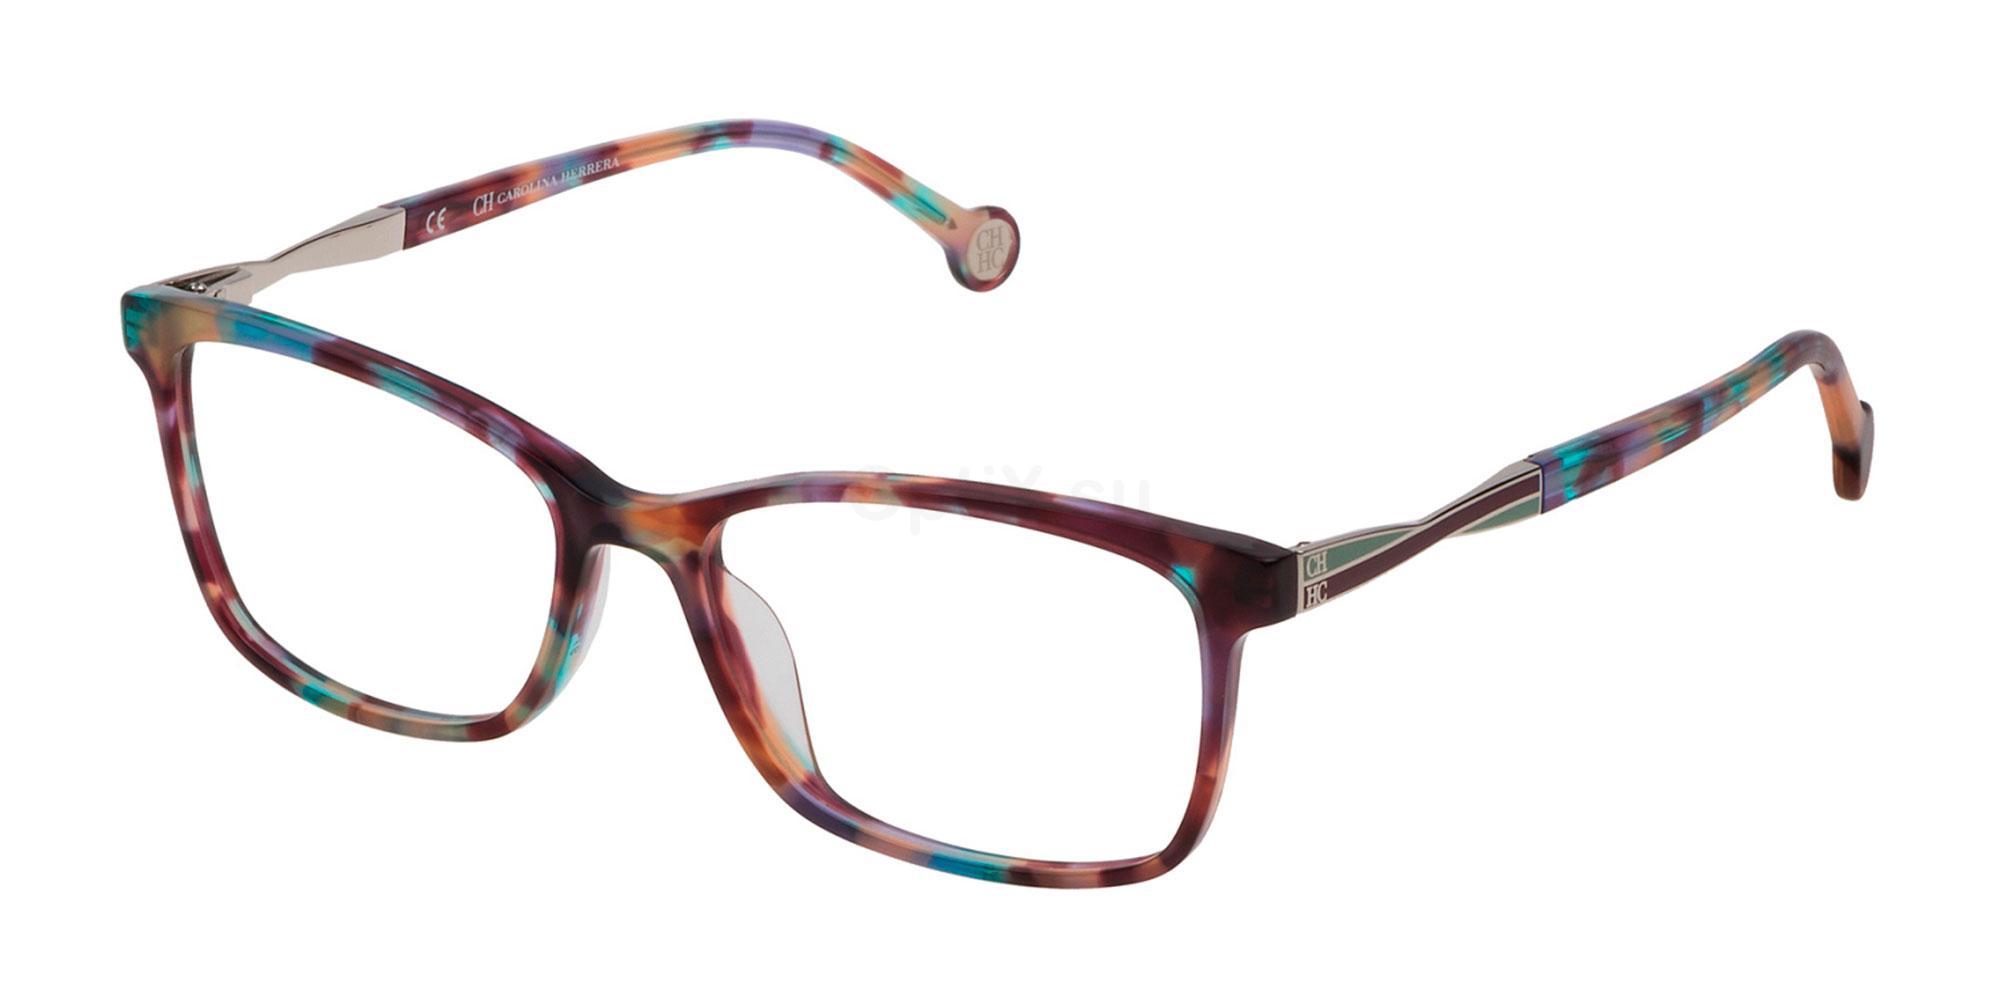 05AH VHE781 Glasses, CH Carolina Herrera